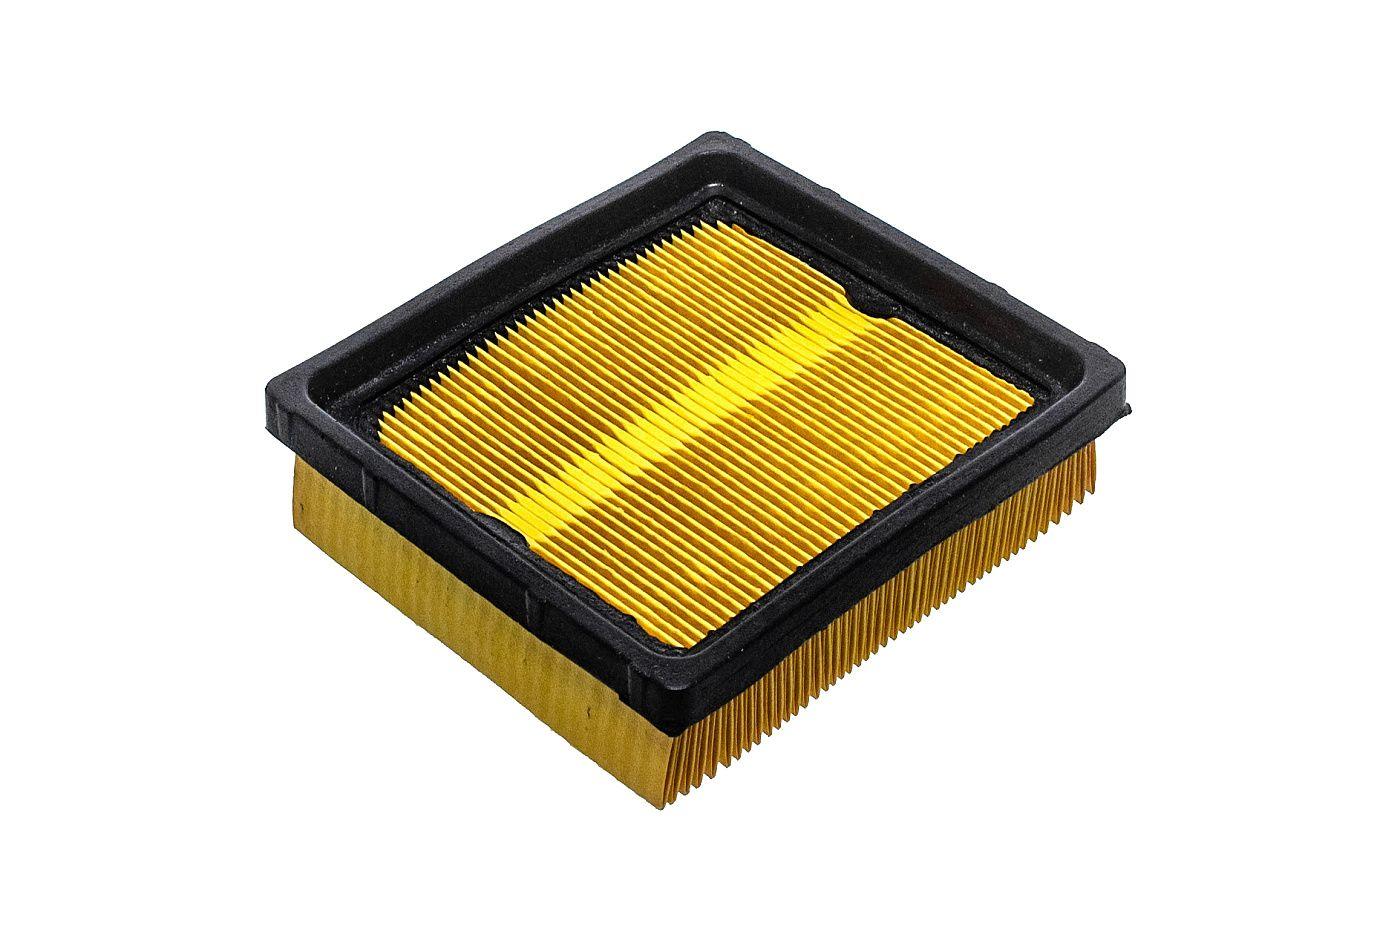 Vzduchový filtr Partner Husqvarna K750